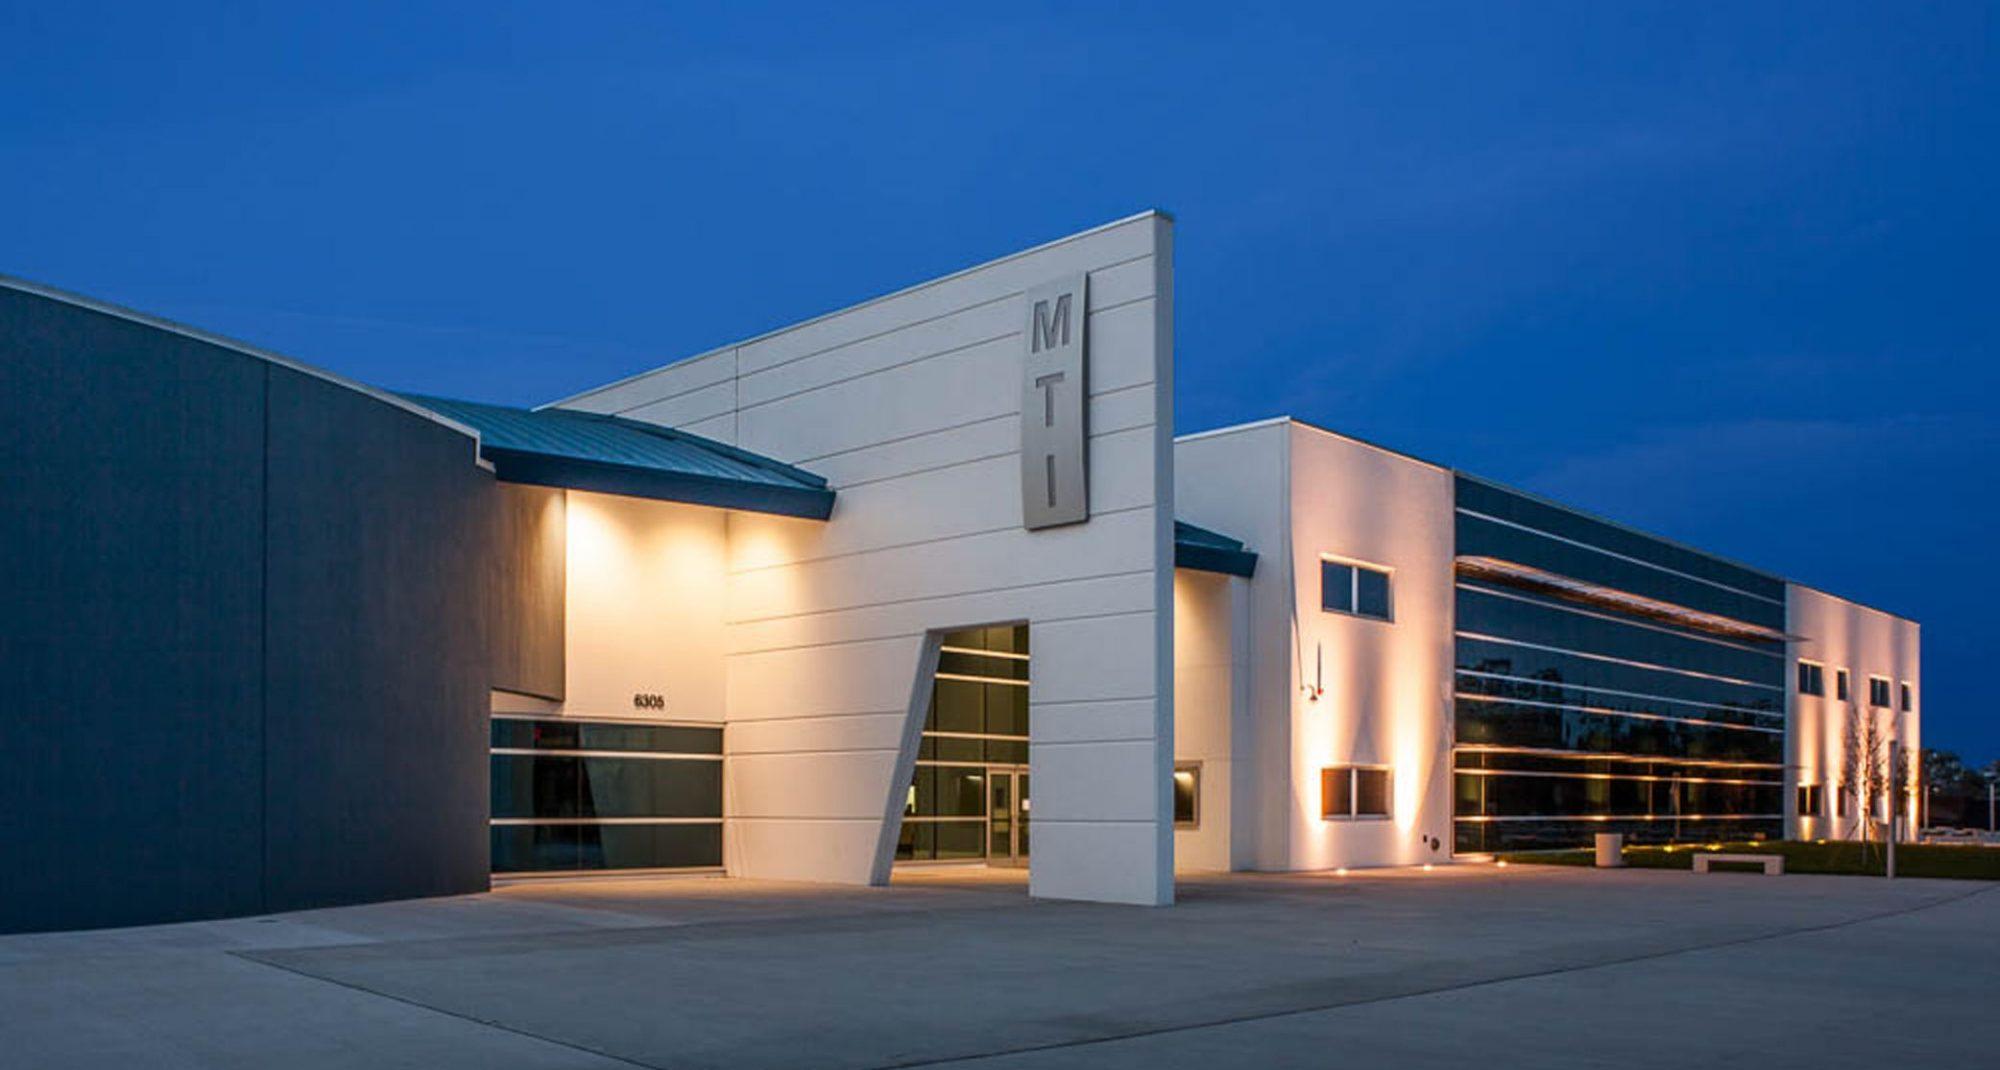 Manatee Tech Institute